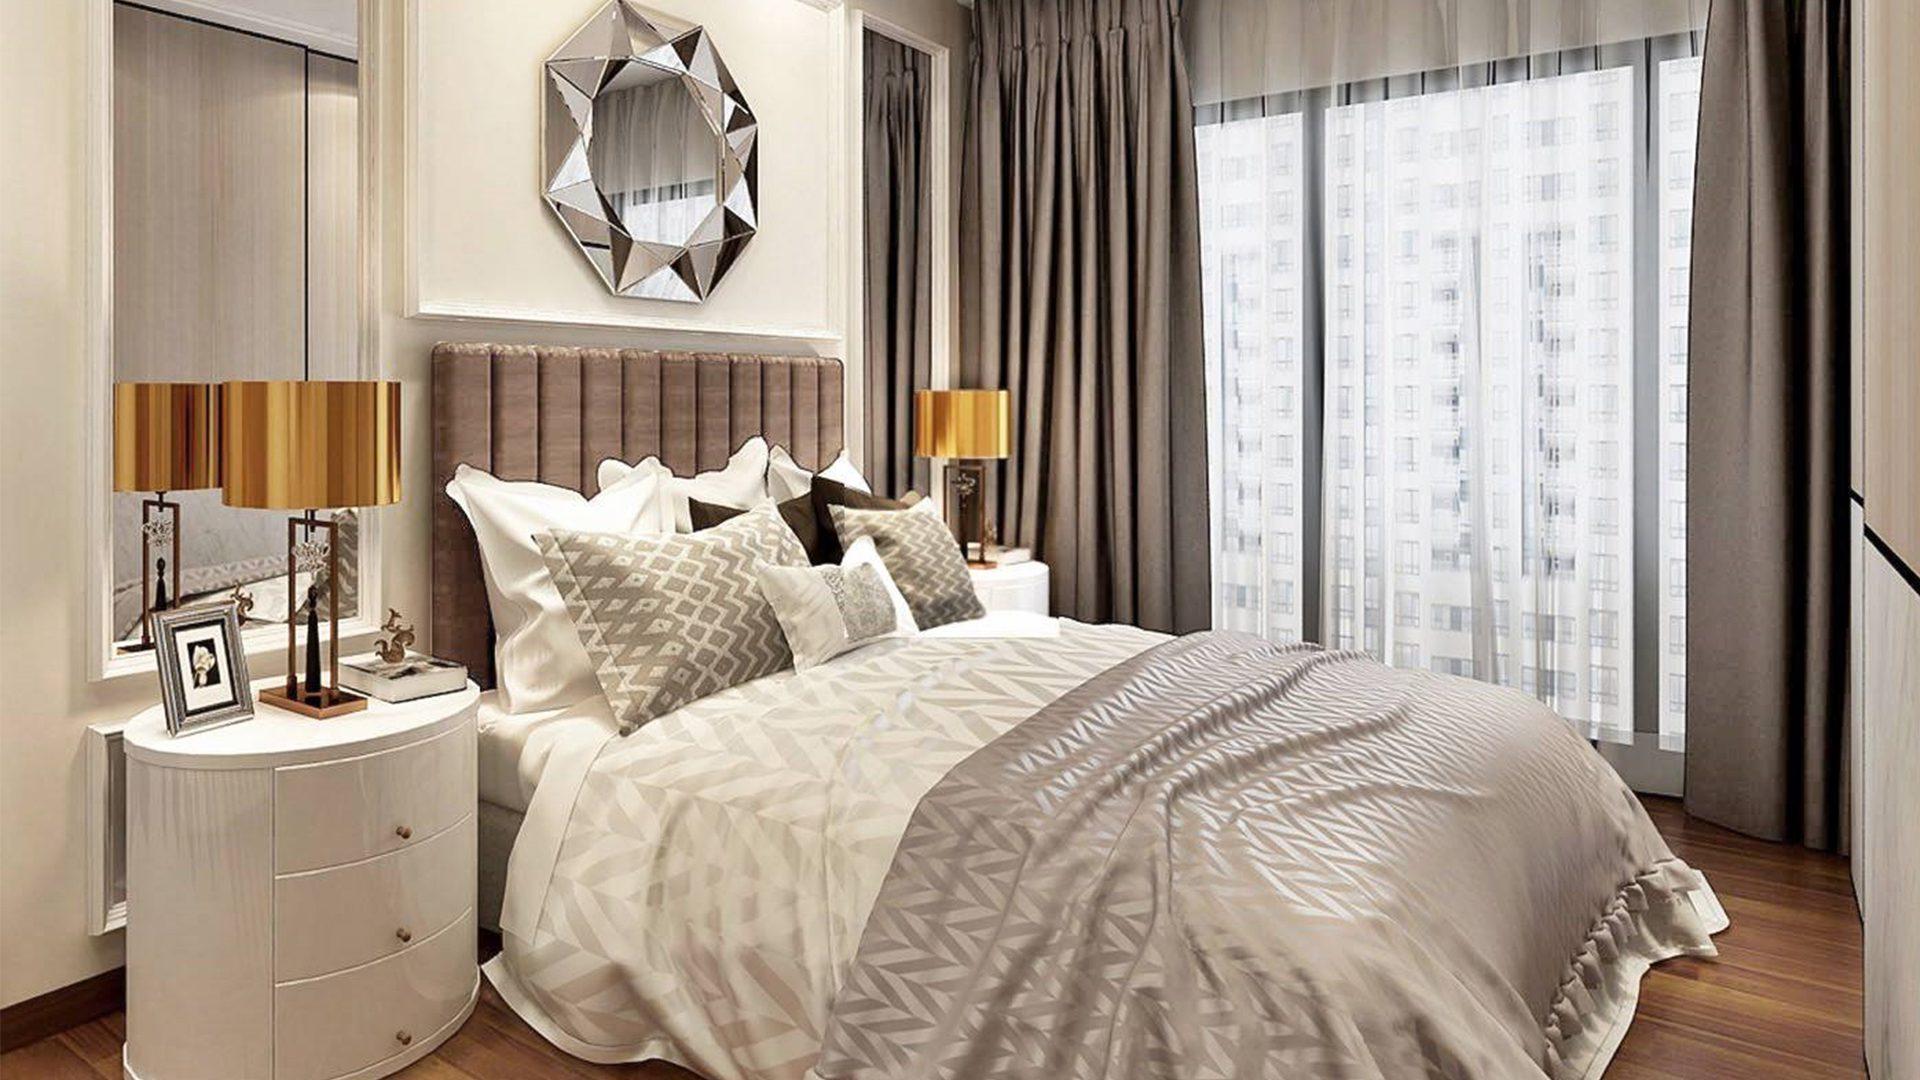 Granderu-Park-Residences-Bedroom-3_sample-interior-design1920x1080_Home-Quarters-SG_KC-Ng-Keng-Chong.jpg